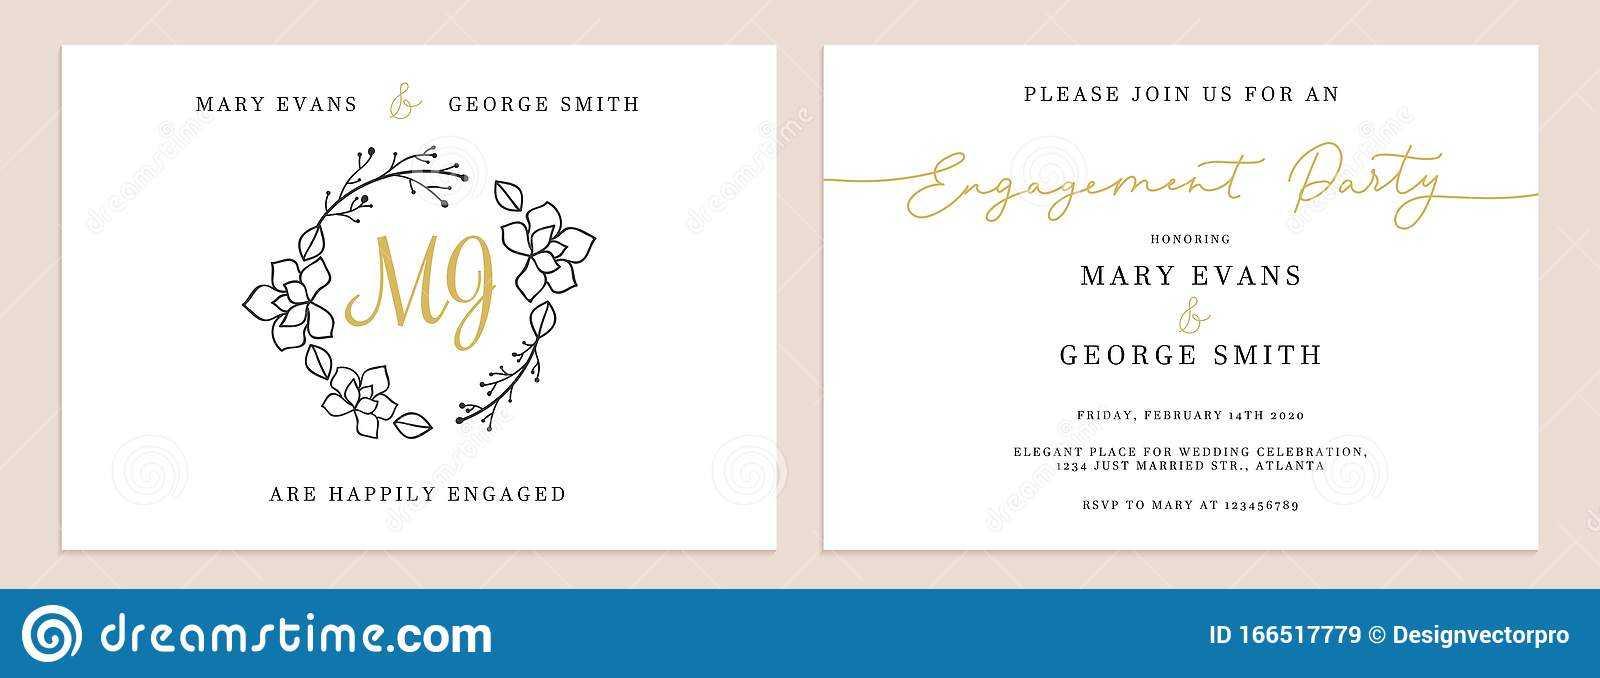 Set Of Wedding Invitation Cards Design Templates Stock Inside Celebrate It Templates Place Cards